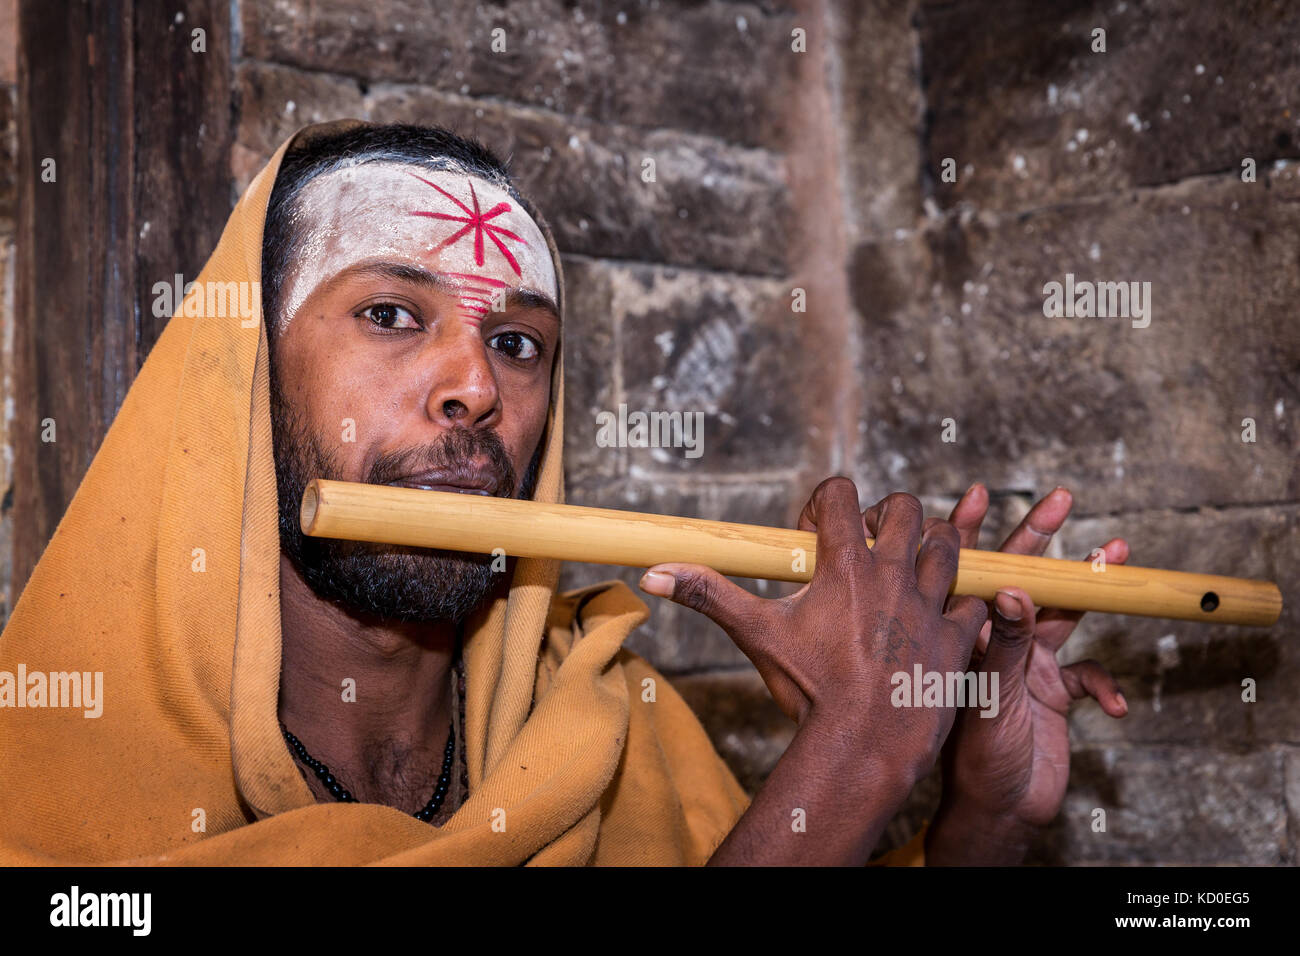 Sadhu or holy man with a flute, Pashupatinath, Kathmandu, Nepal Stock Photo